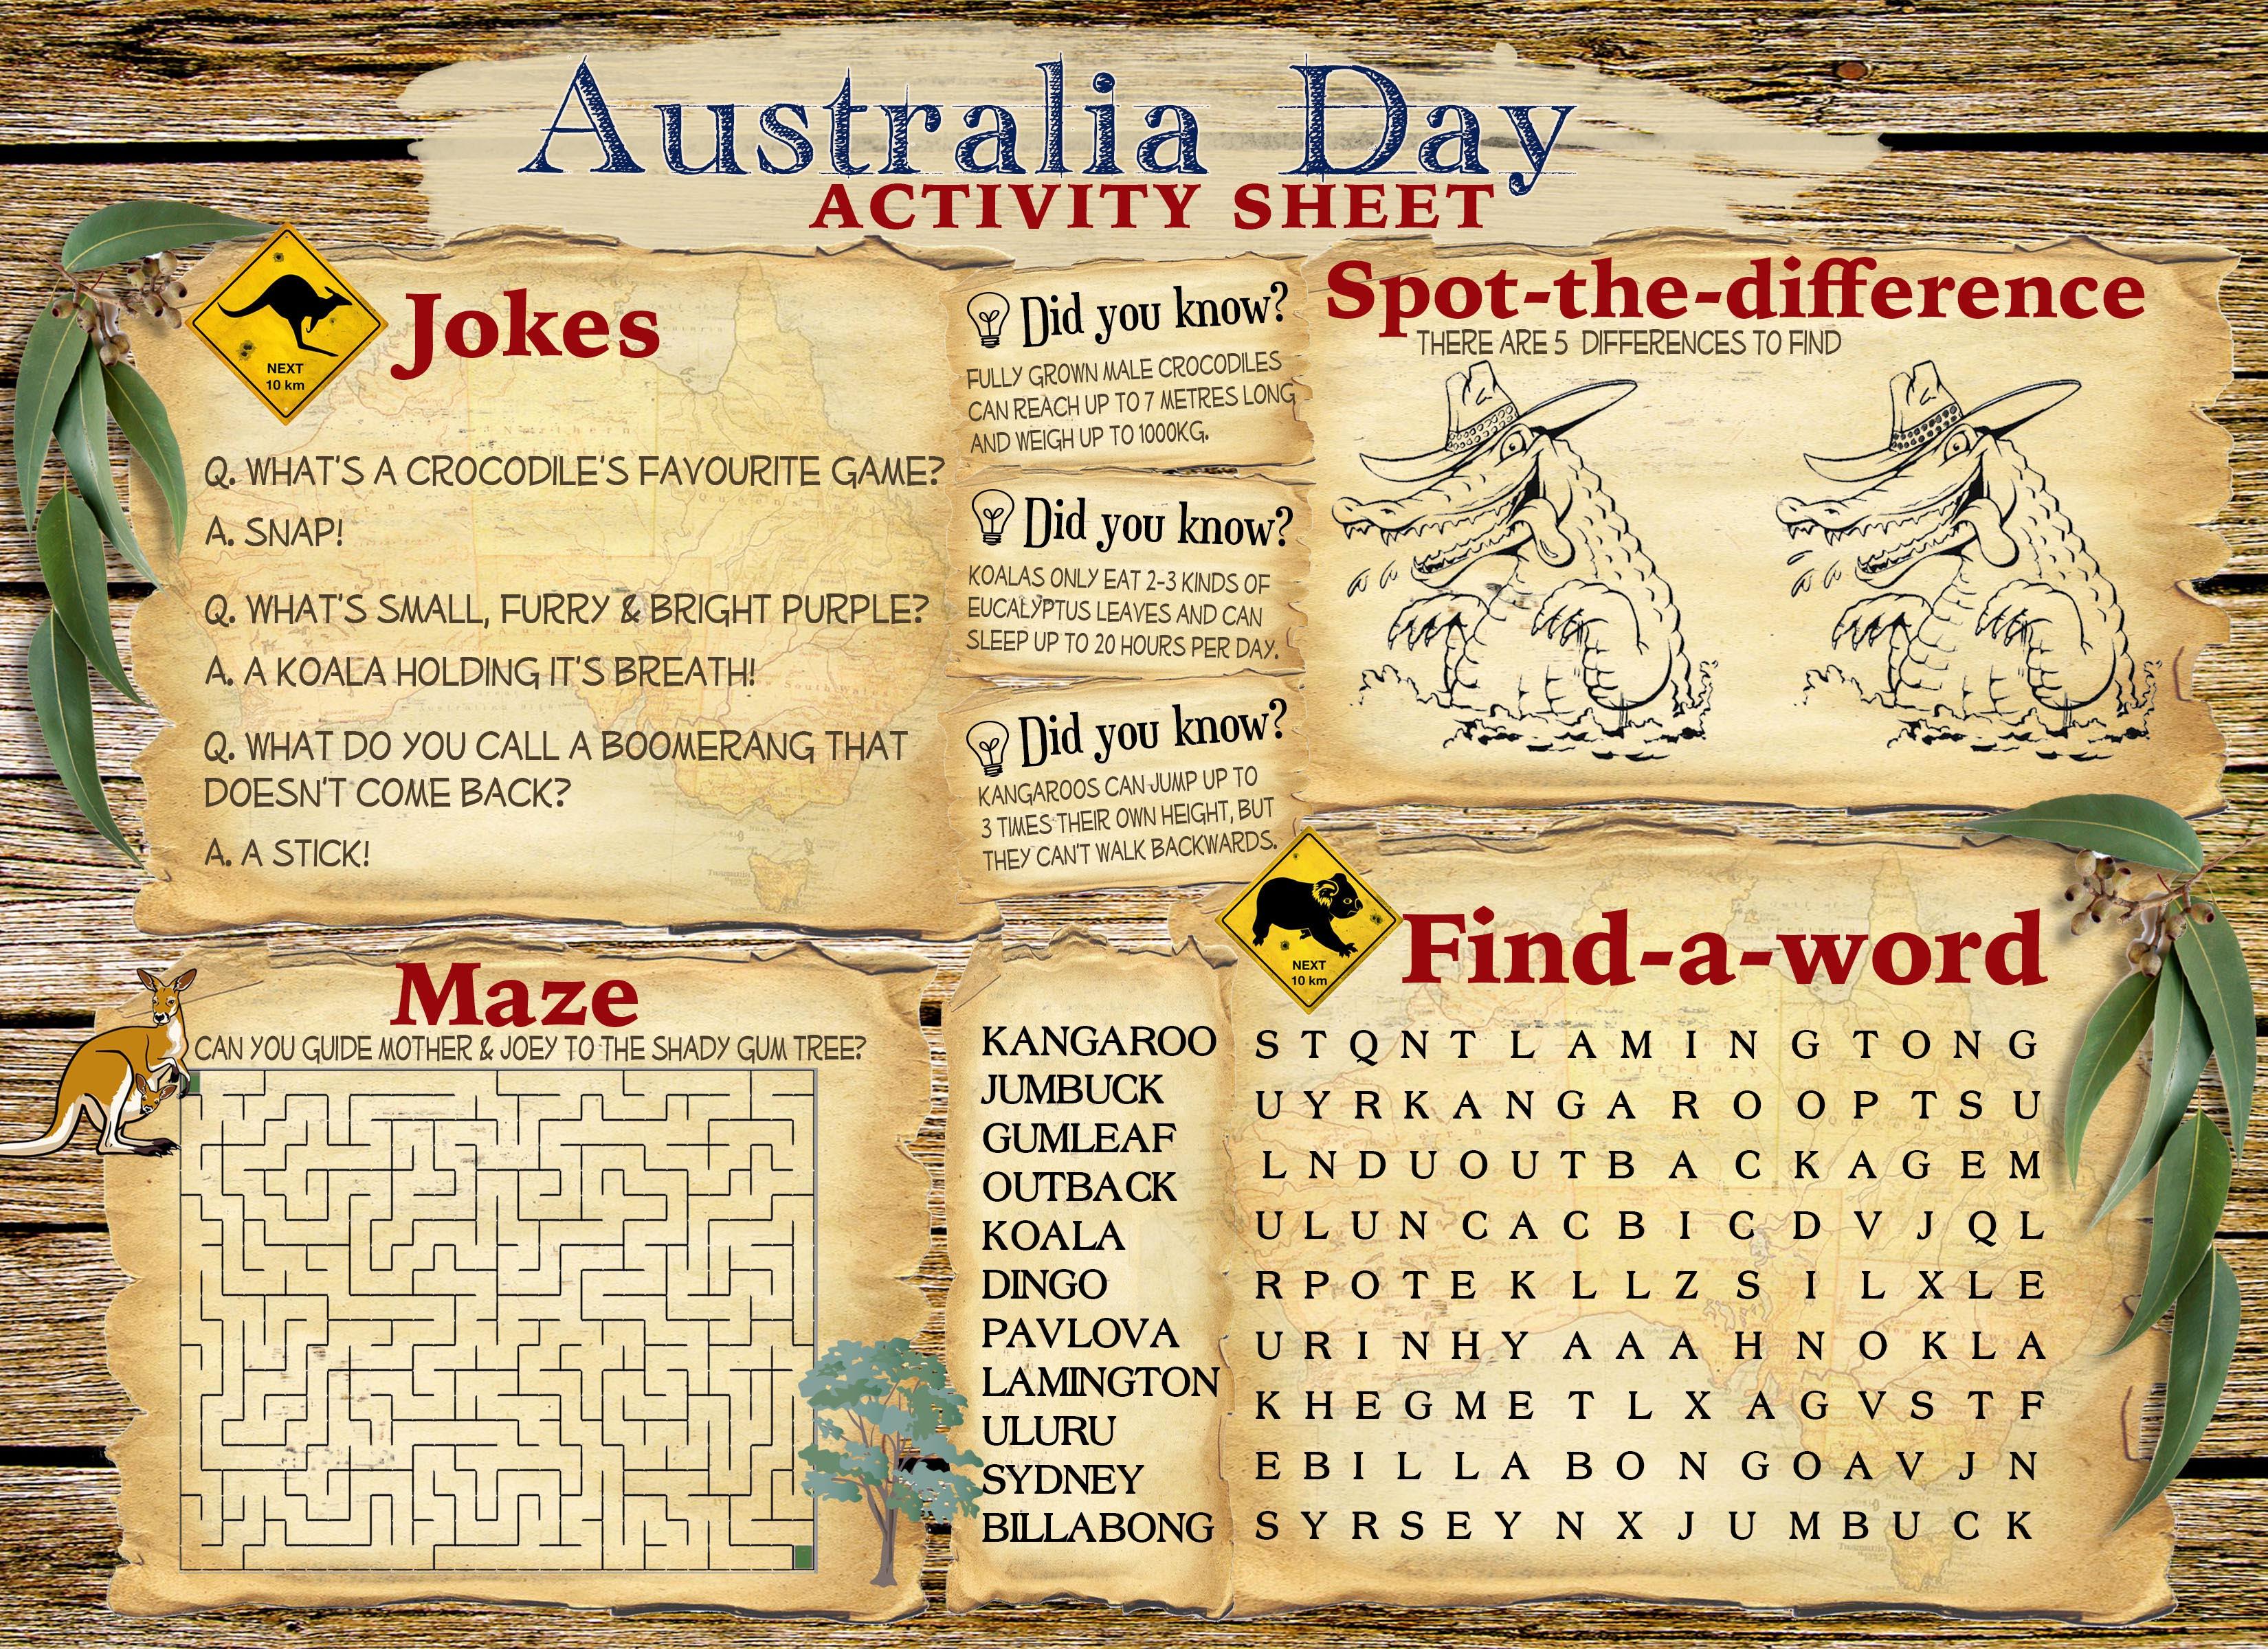 Australia Day Activity Sheet Free Printable